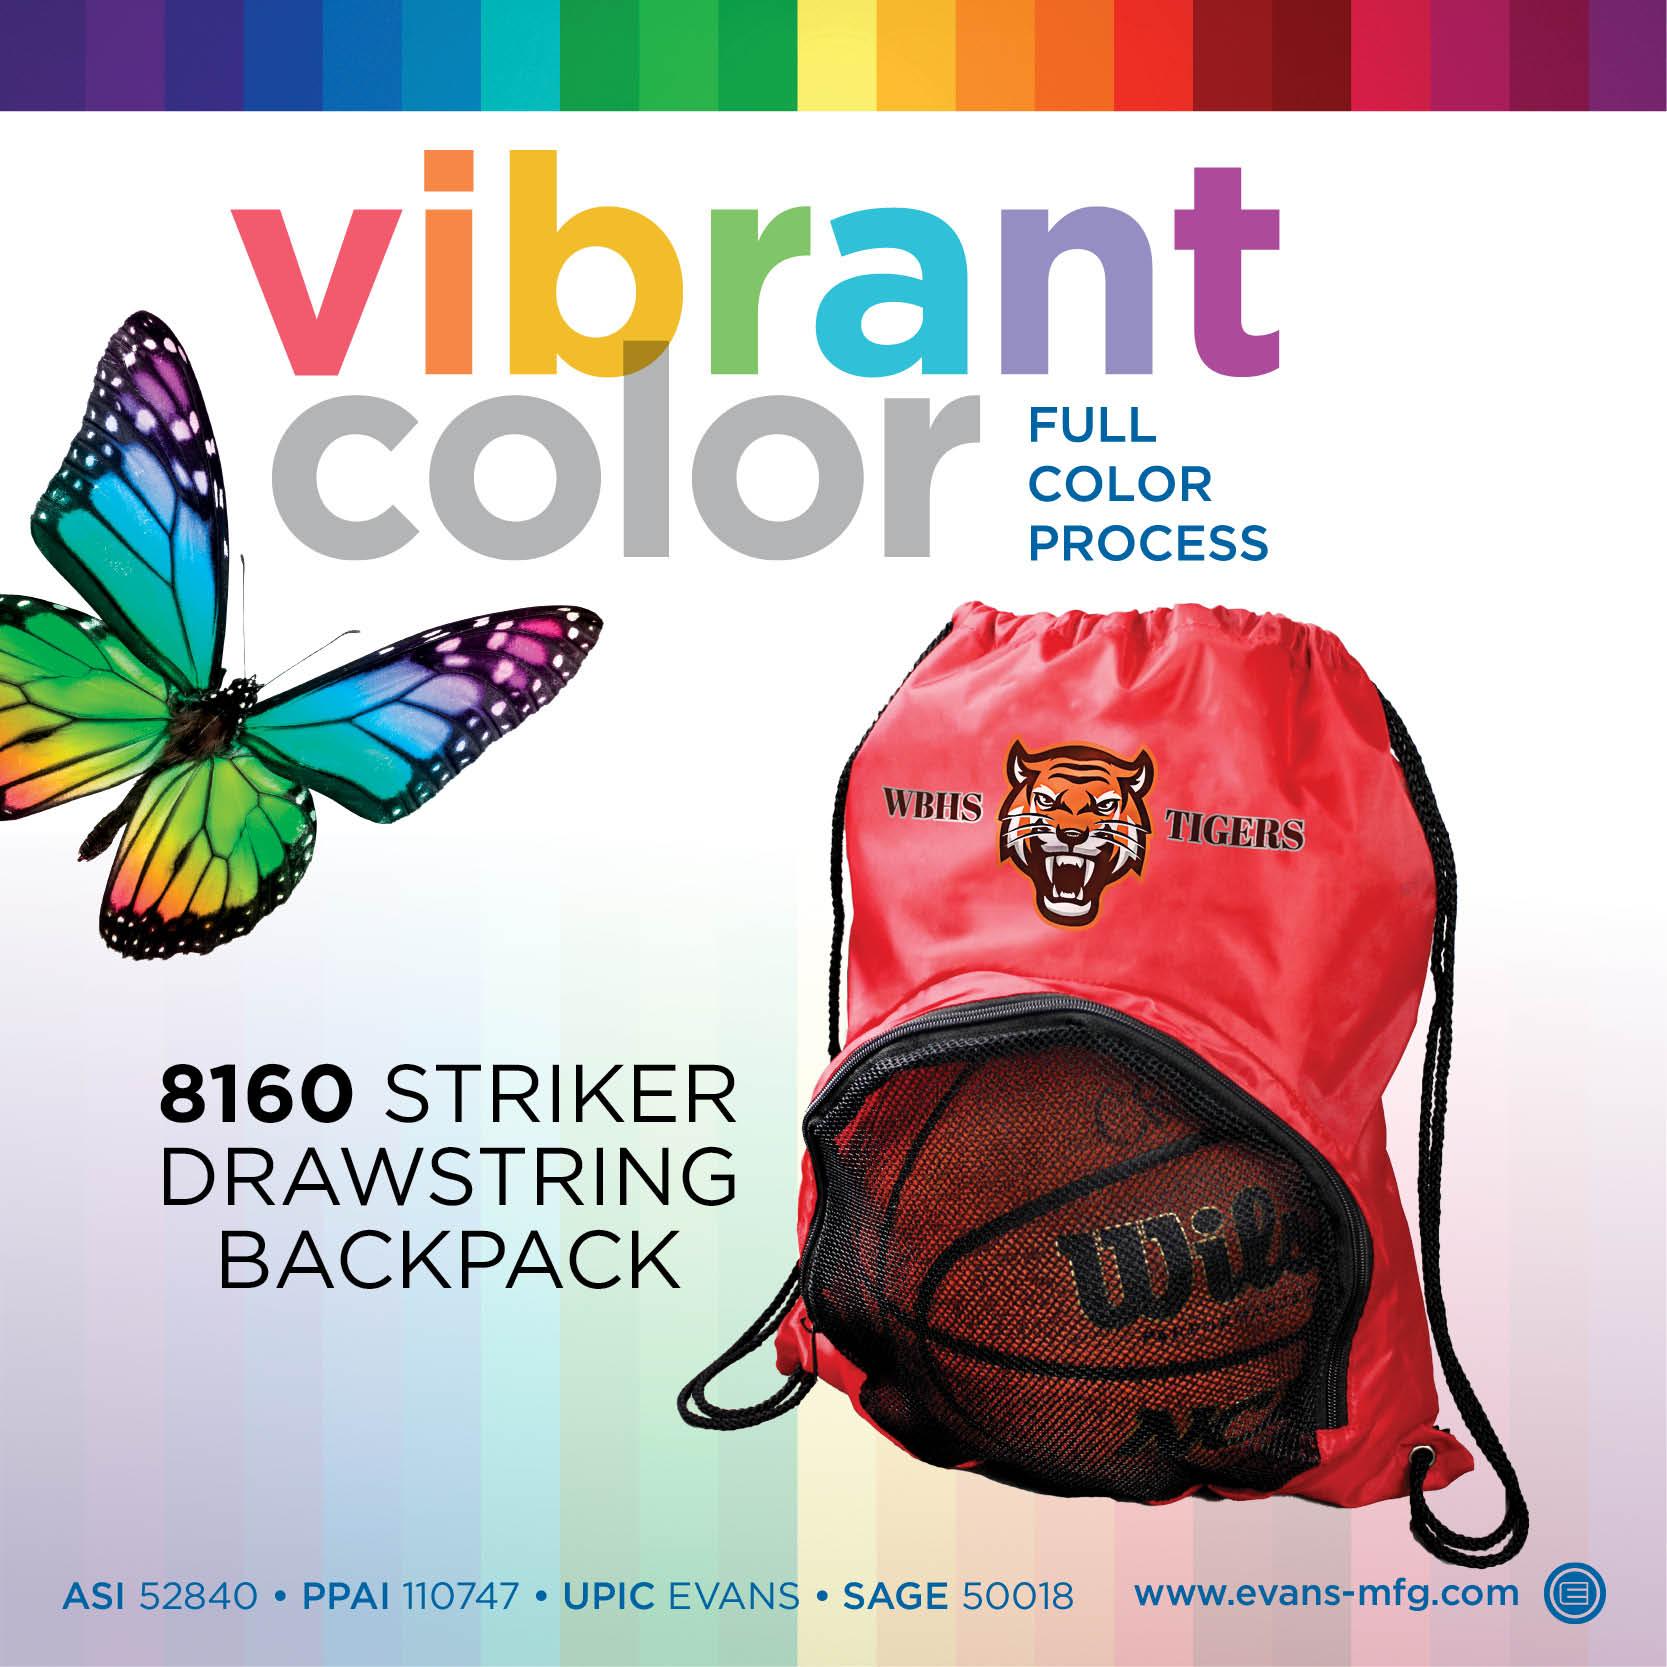 8160 Striker Drawstring Backpack VD